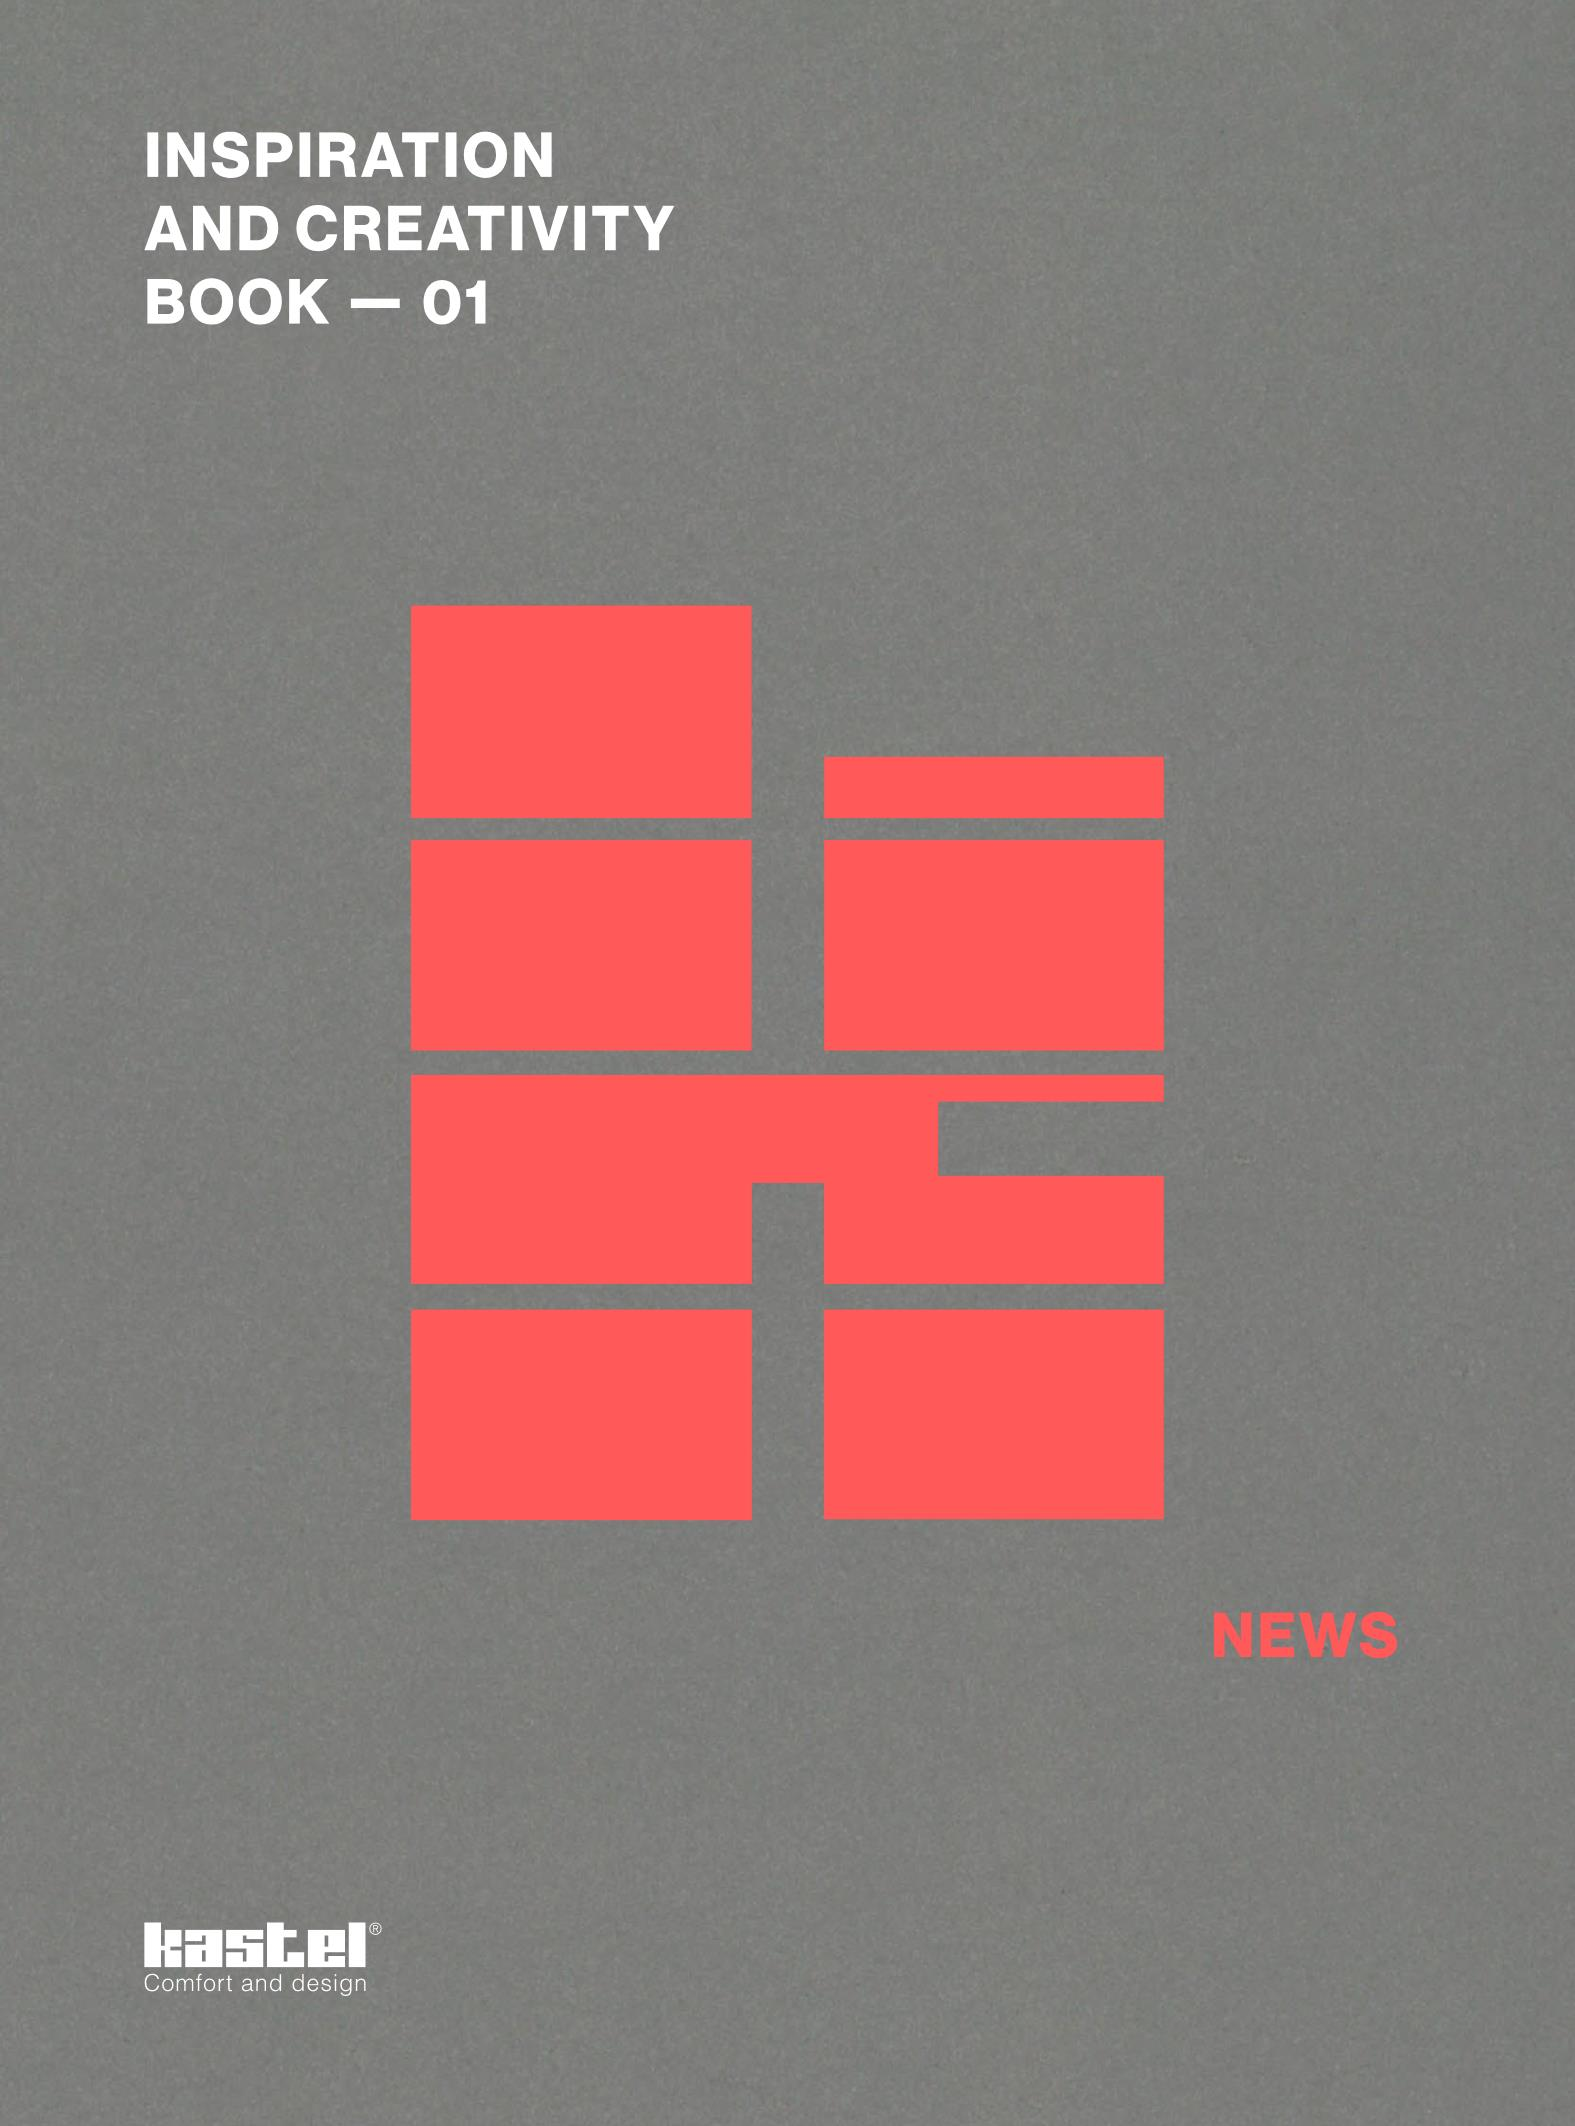 Inspiration and Creativity book-01